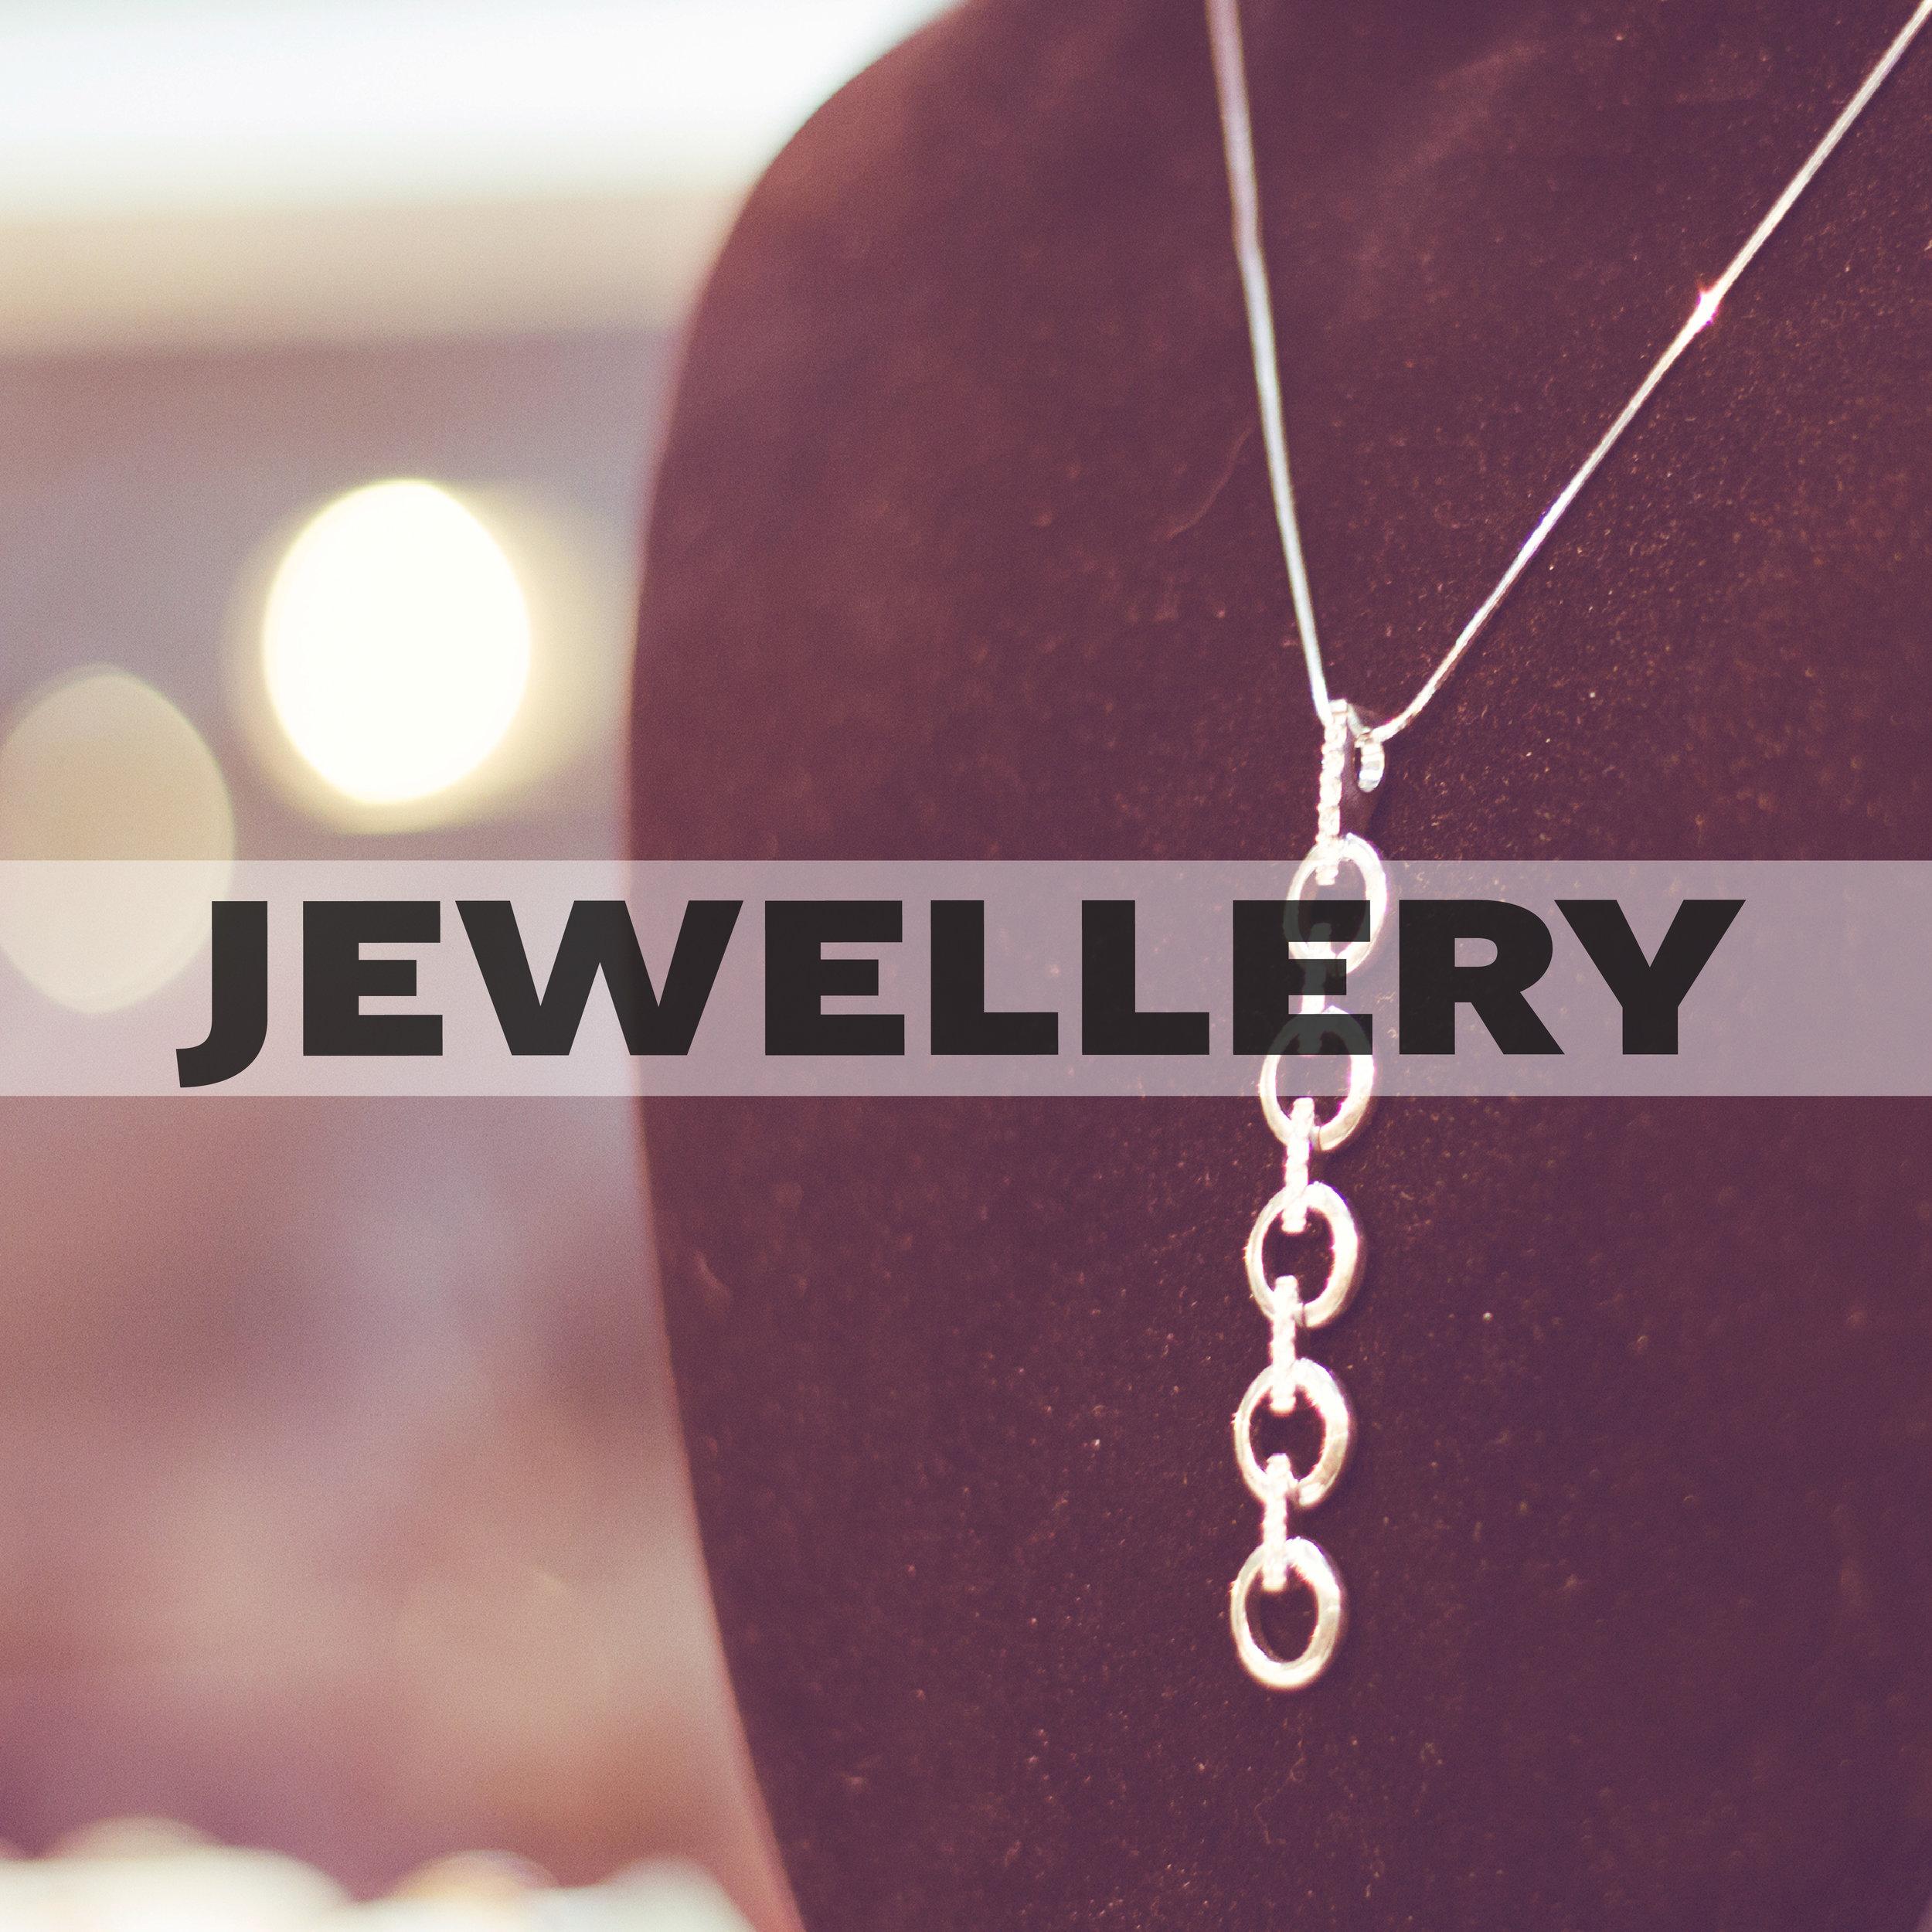 JEWELLERY-01.jpg